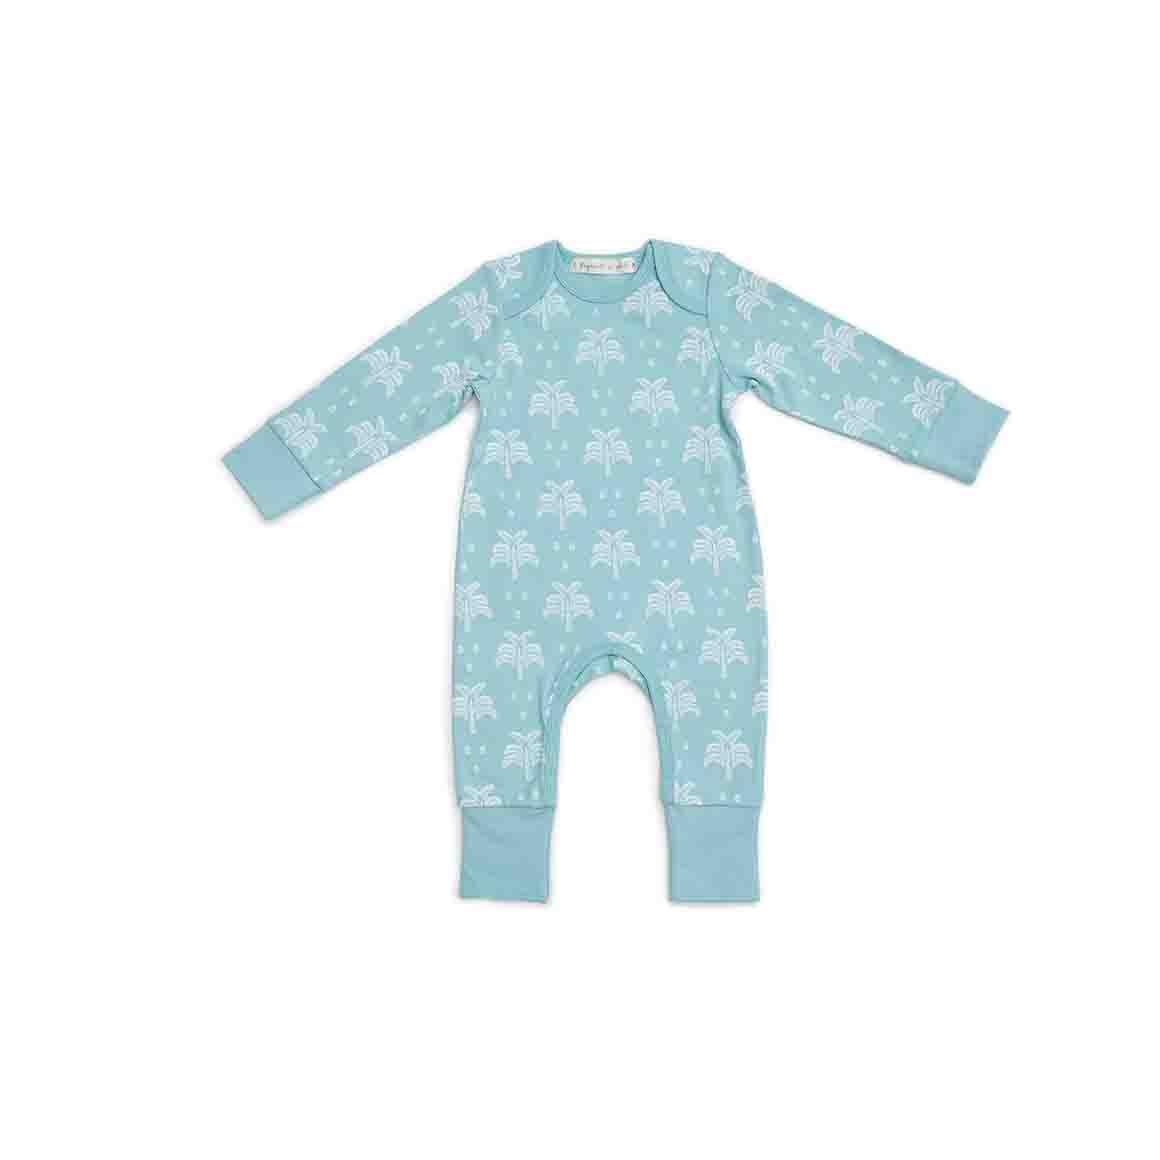 Baby Sleepsuit - Long Arm/Long Leg (Aquatic Blue In Palms & Pineapples Print)   Trada Marketplace